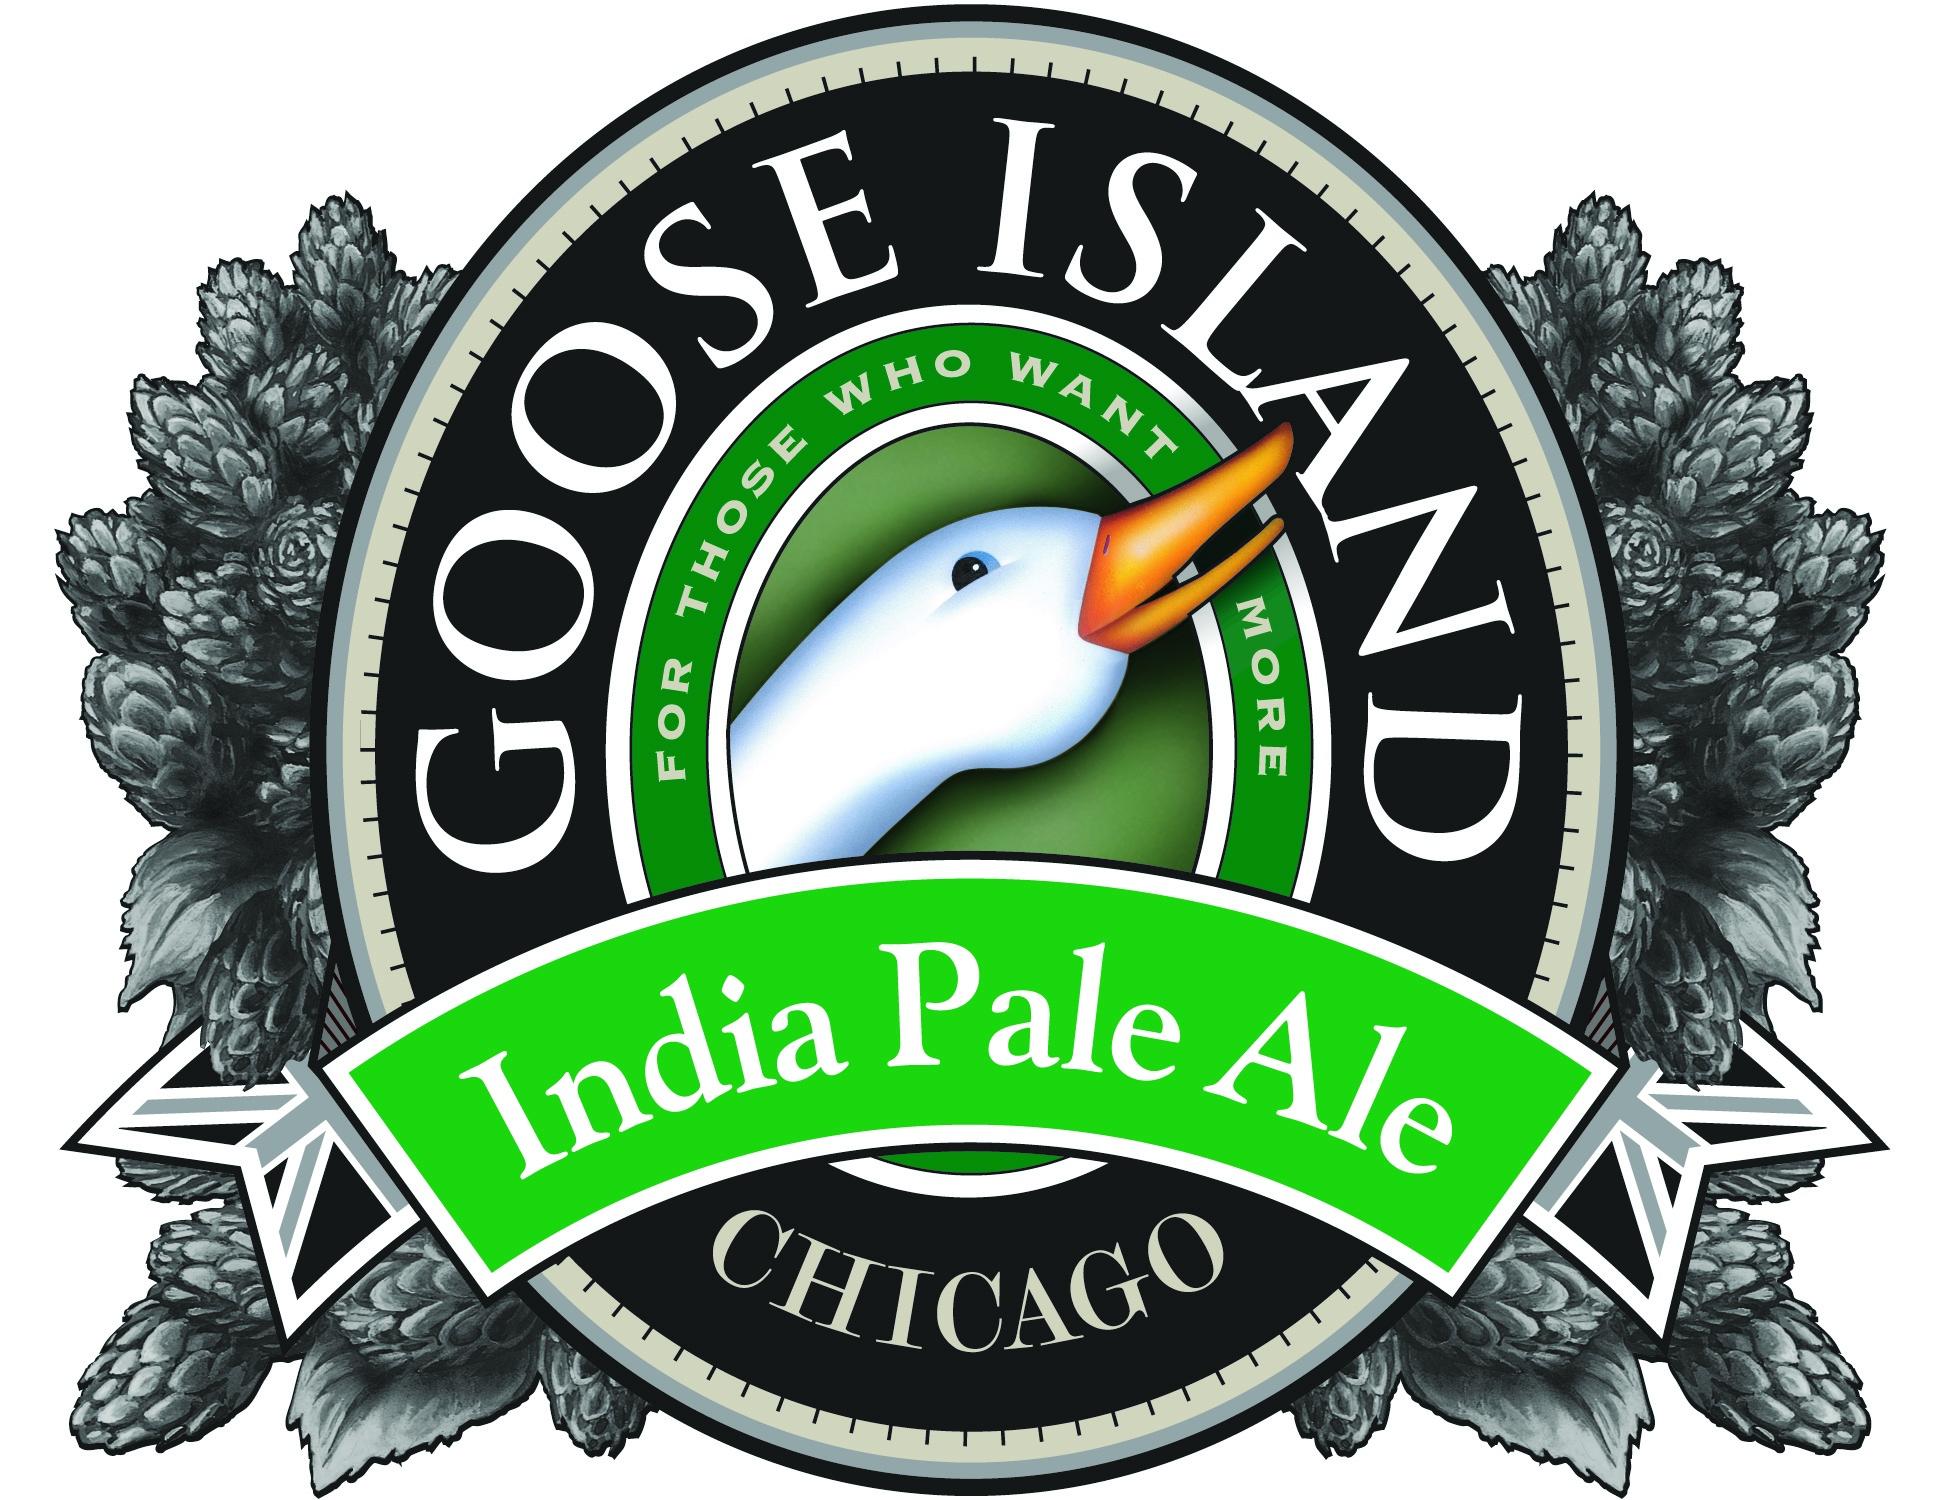 Goose Island New York Beer